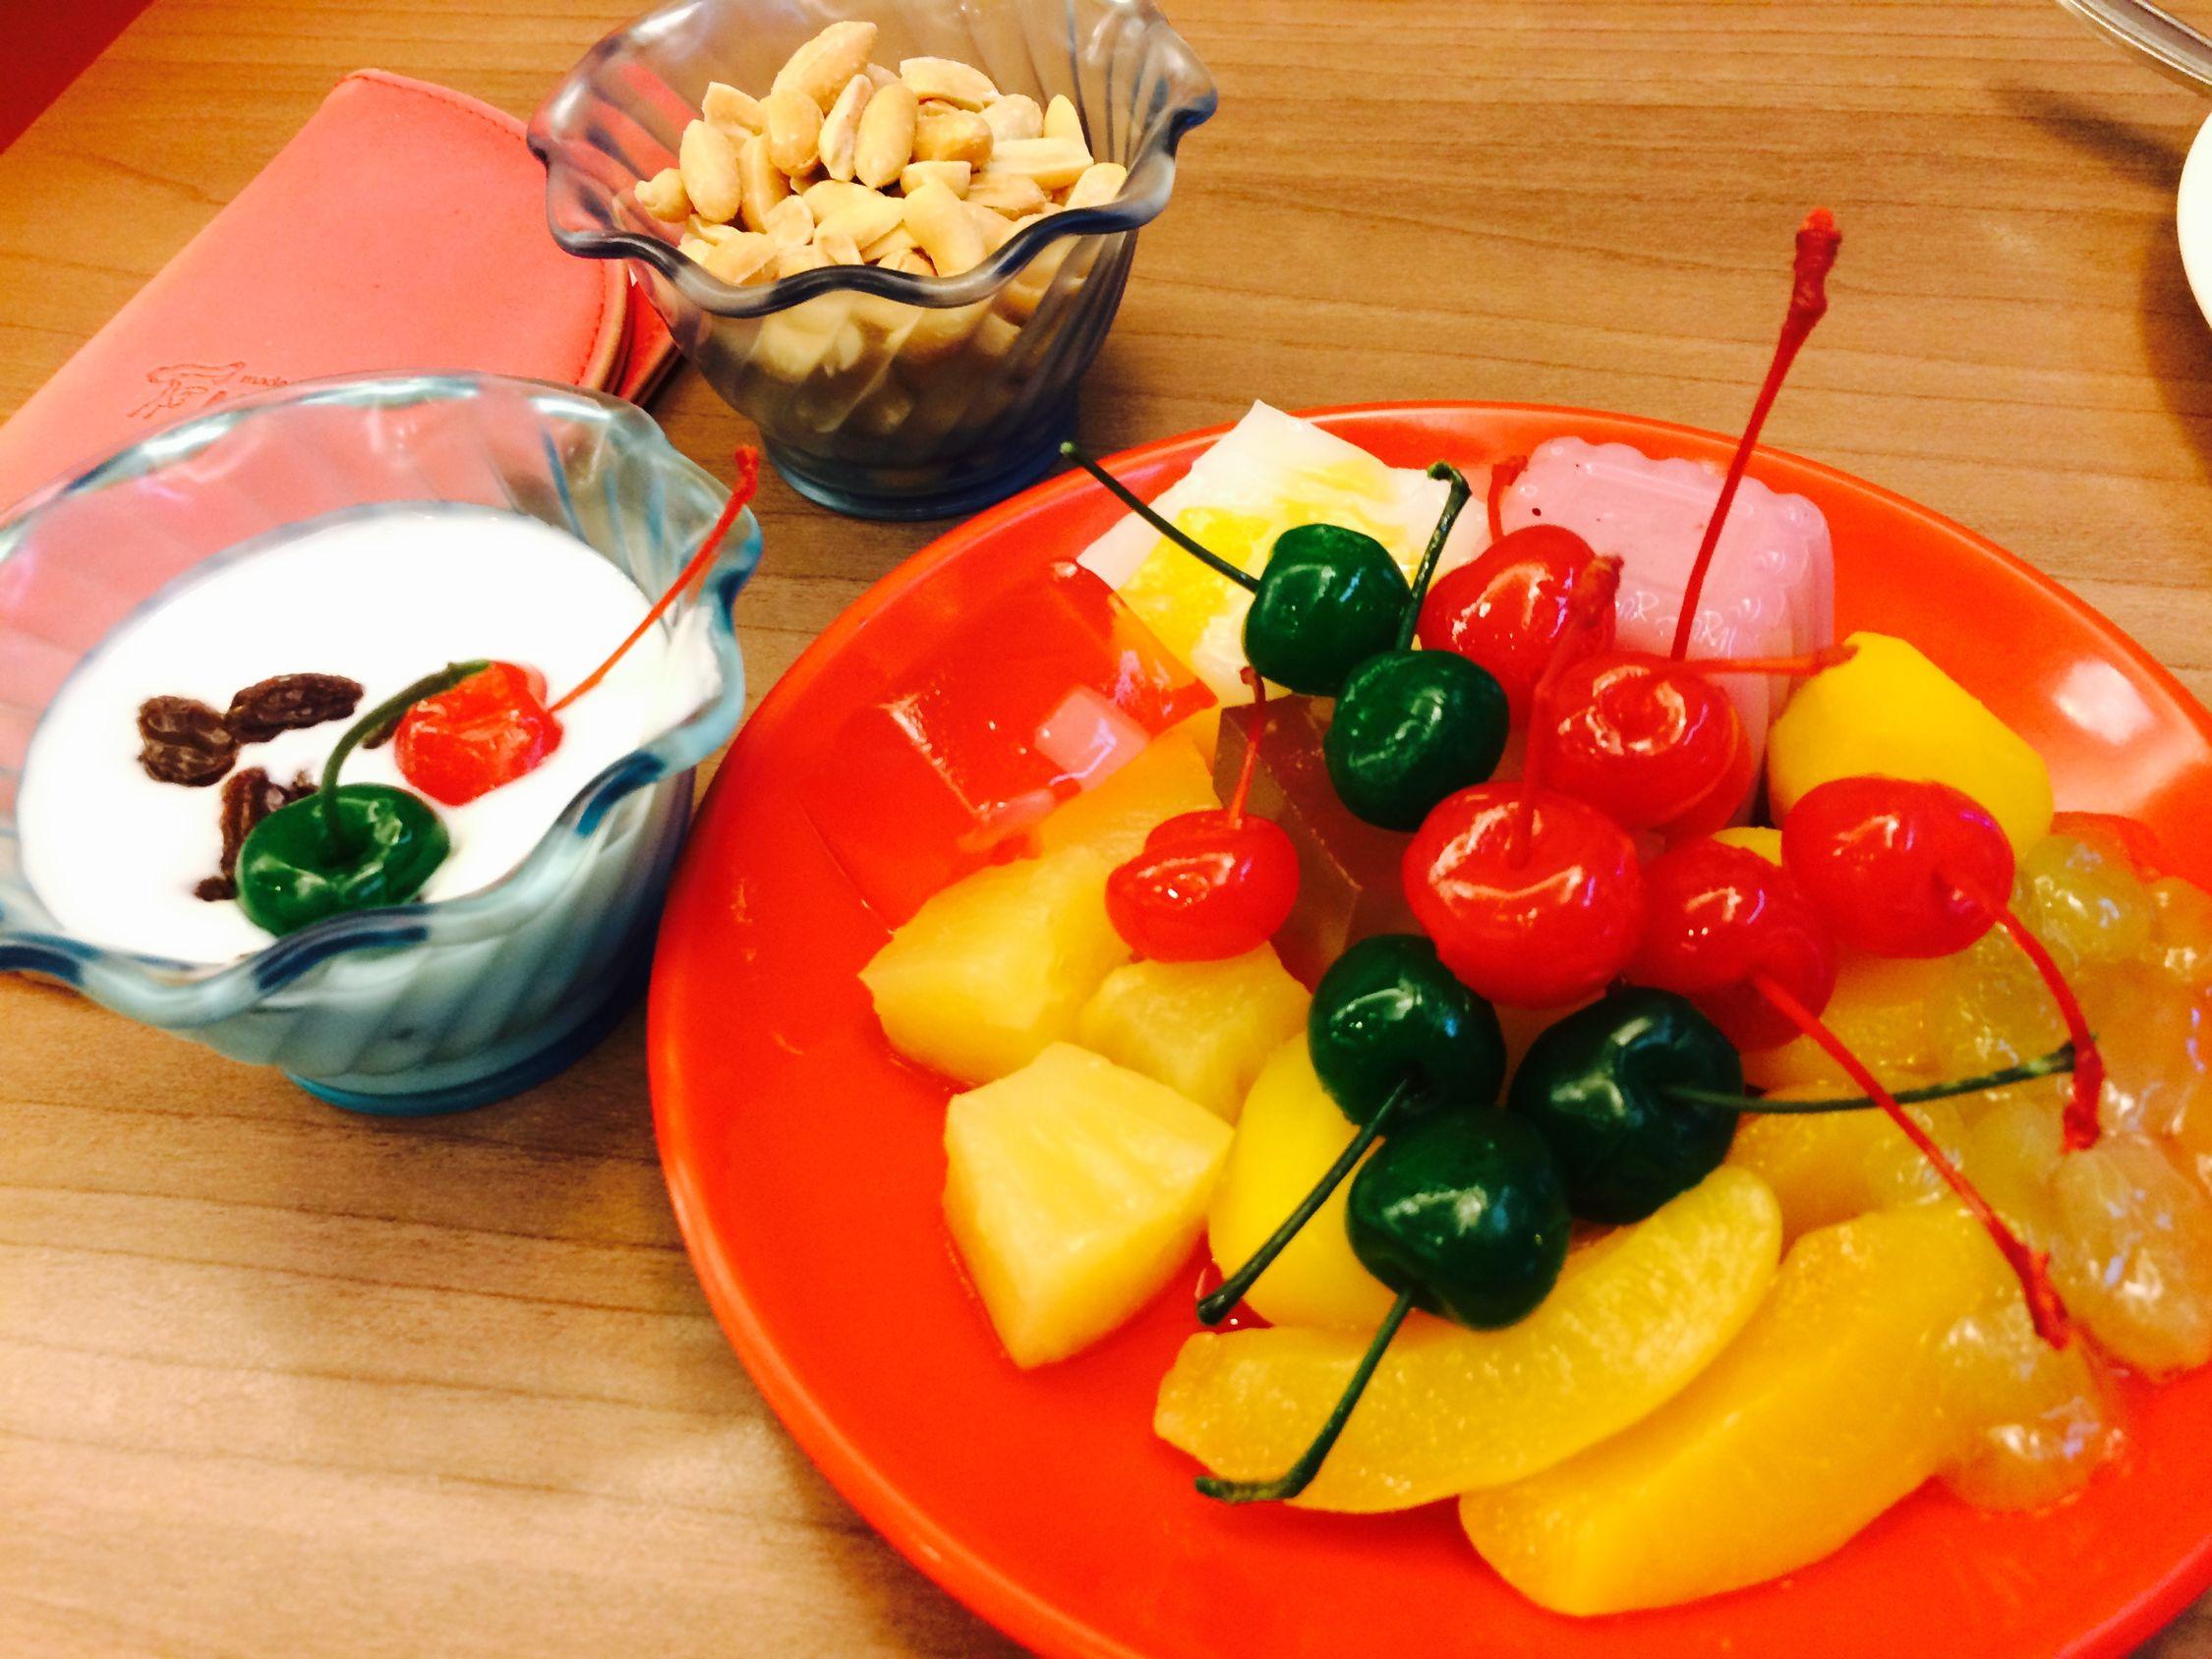 Saladbar Mrpizza Fruits Yogurt Foodporn